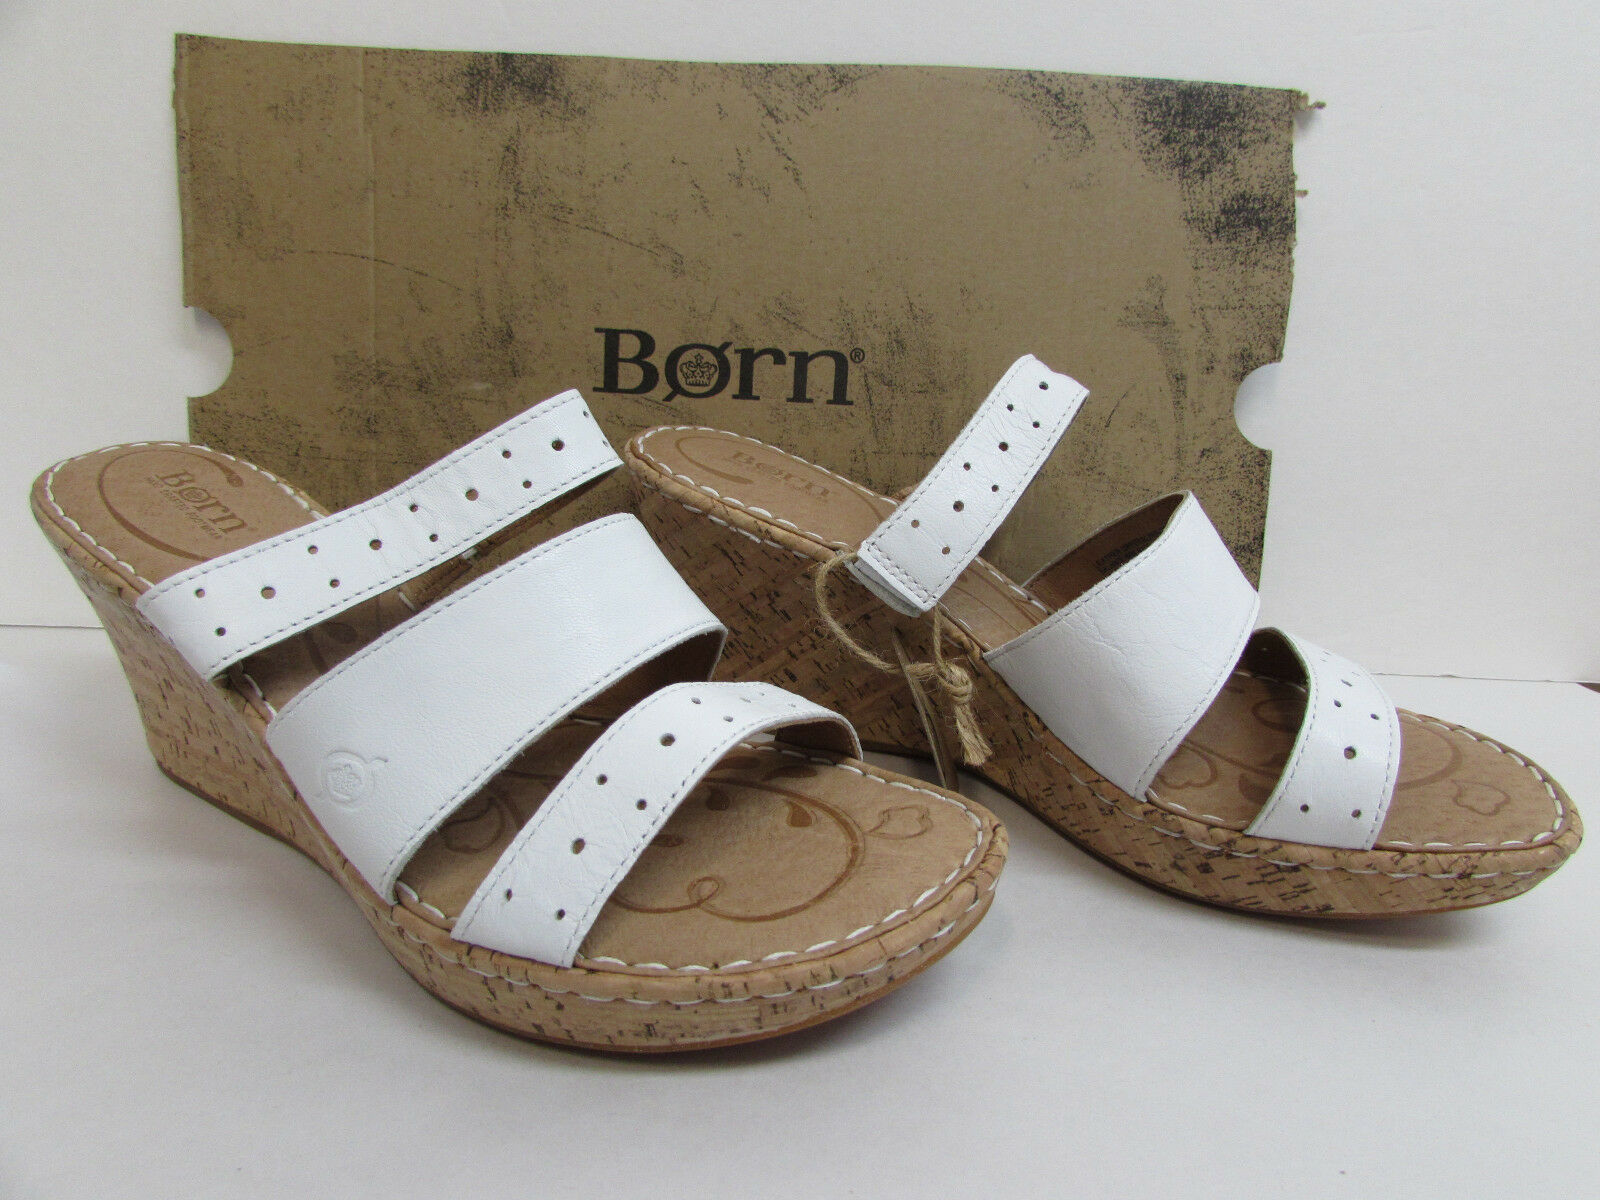 Born Größe 10 Weiß Cork Heels Wedge Heels Cork New Damenschuhe Schuhes 1a9eec